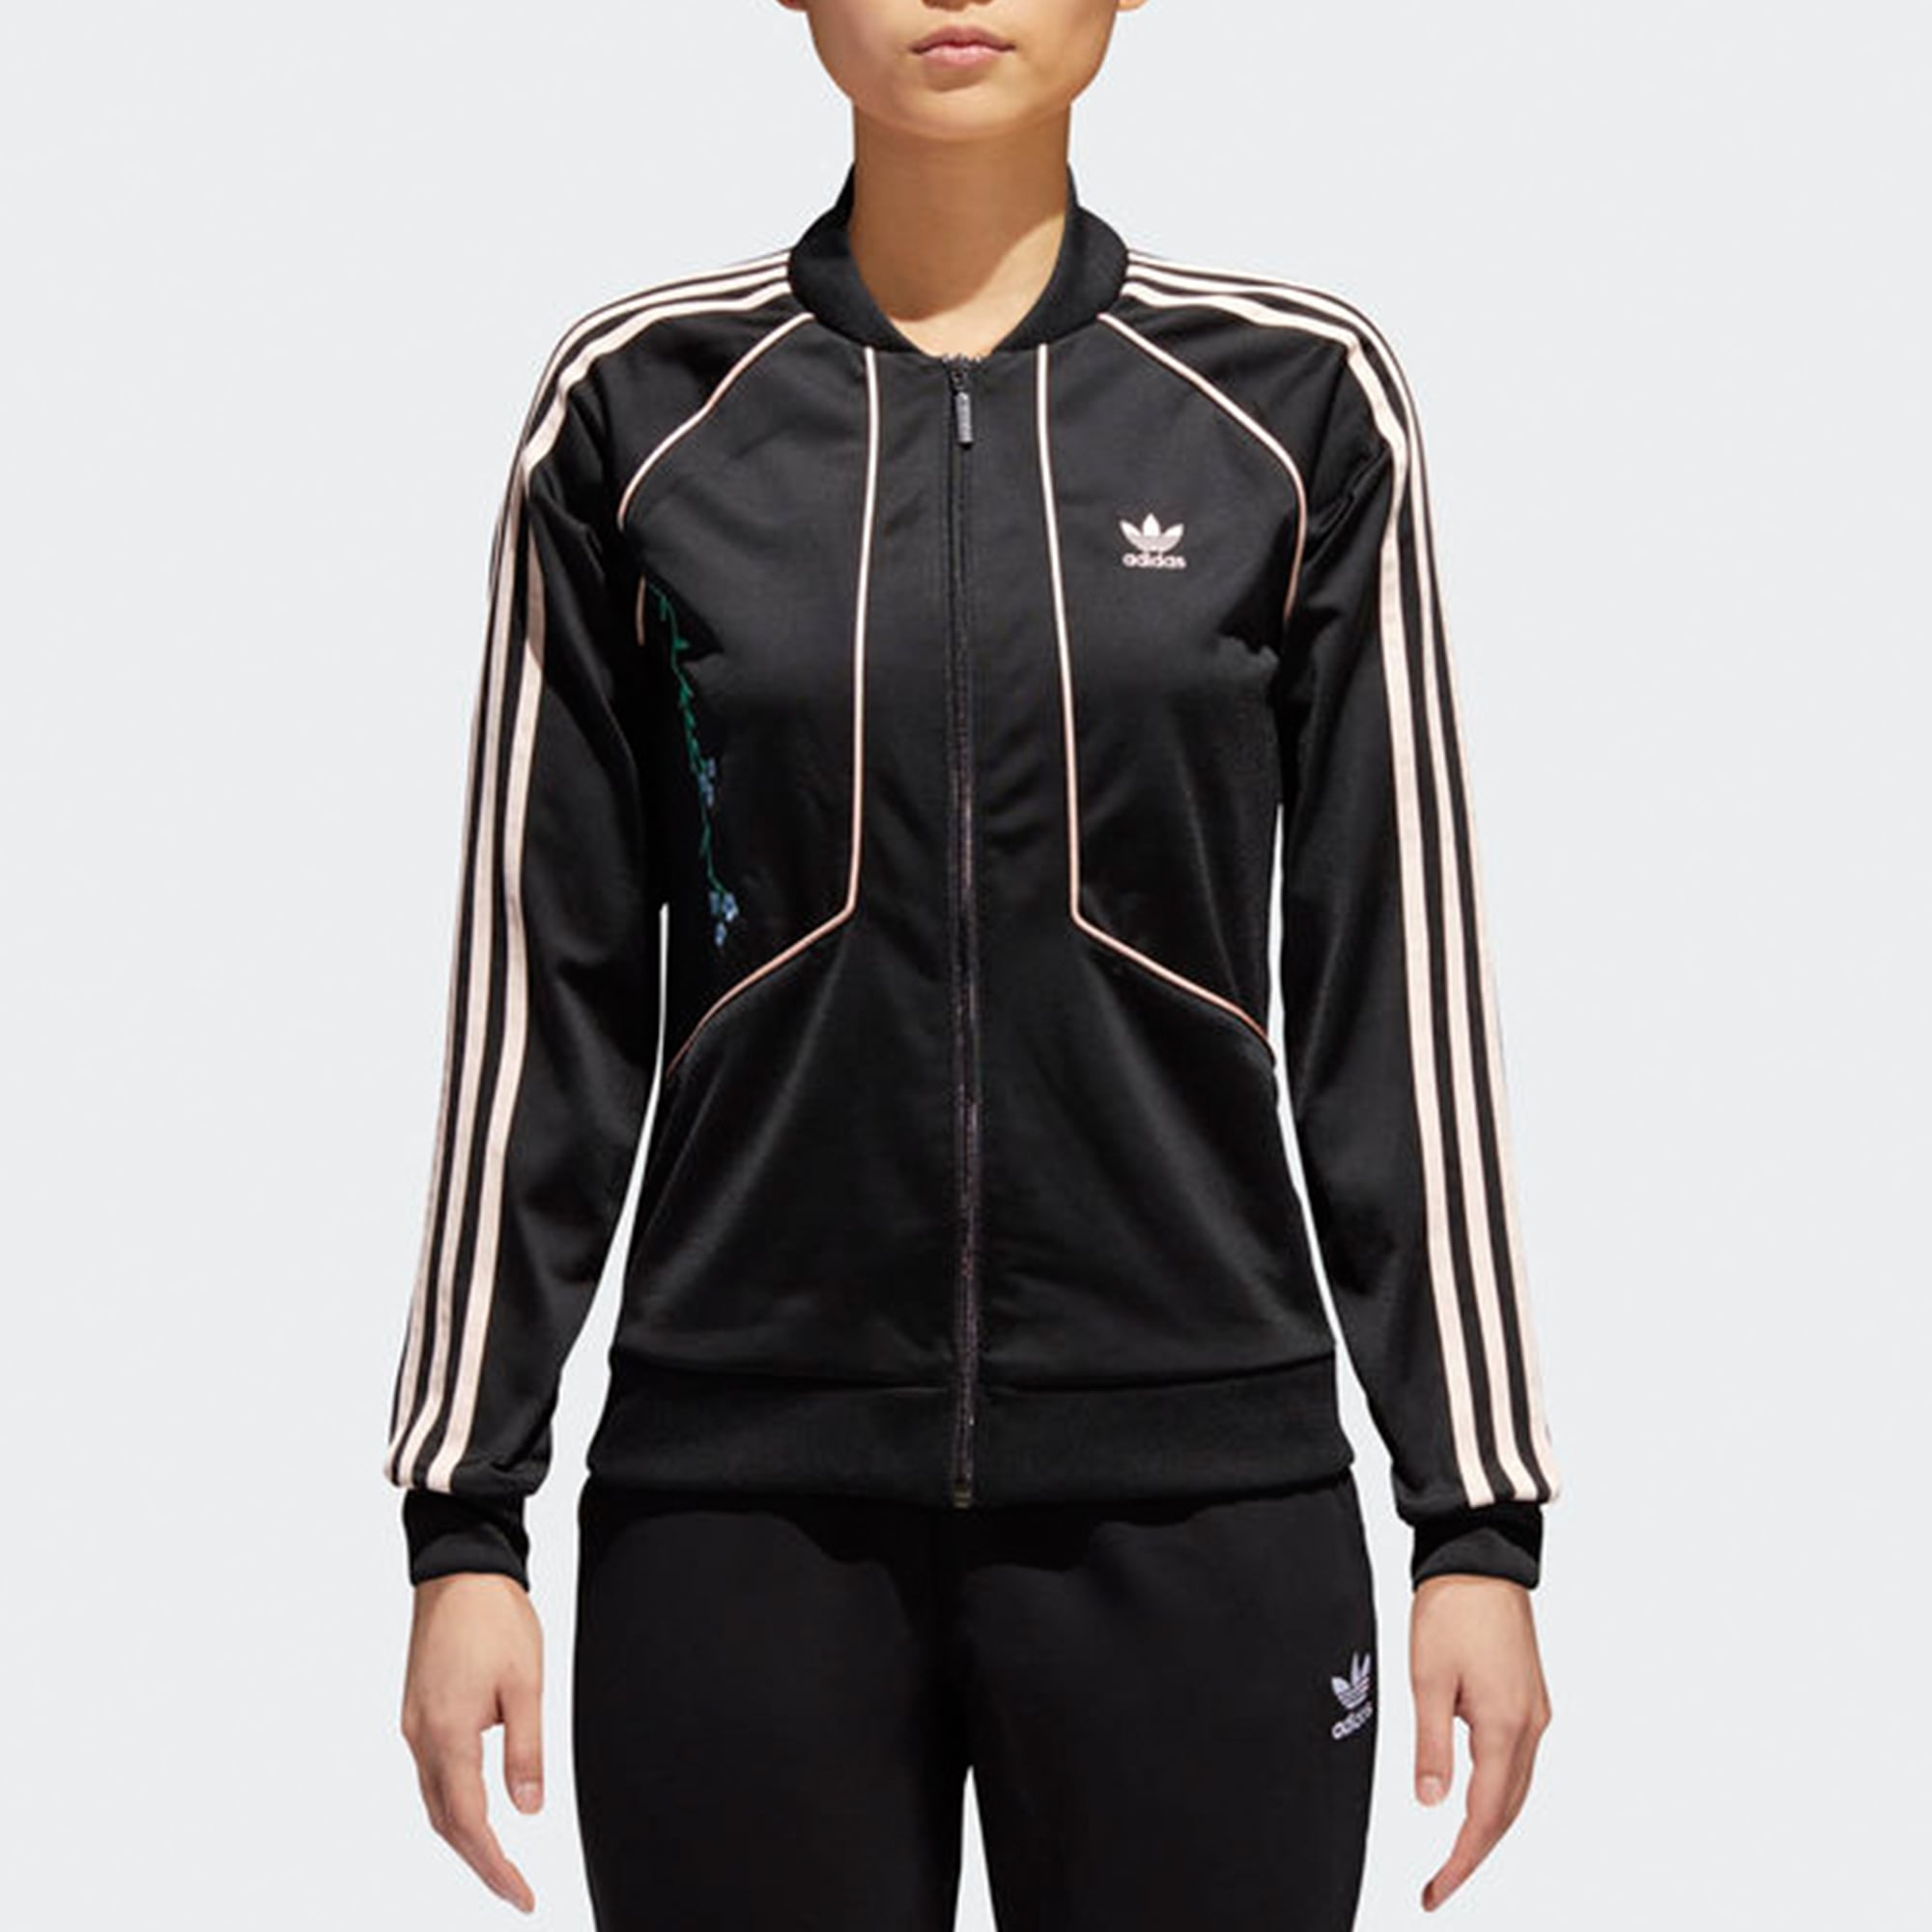 SST Track Jacket by Adidas Clothes Online | Women Originals